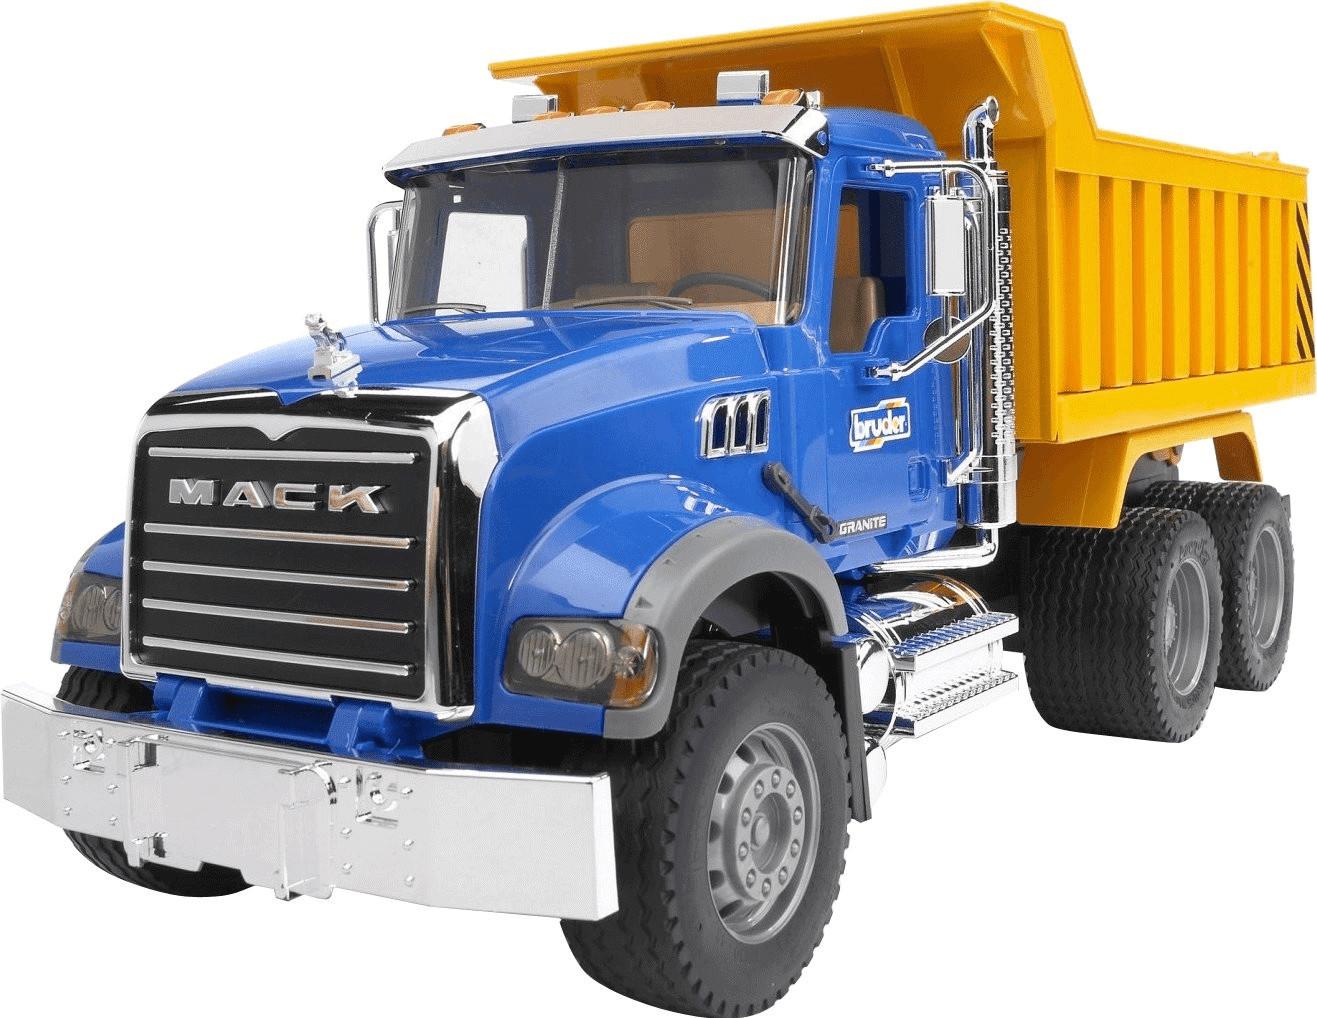 Image of Bruder Camion MACK ribaltabile (02815)